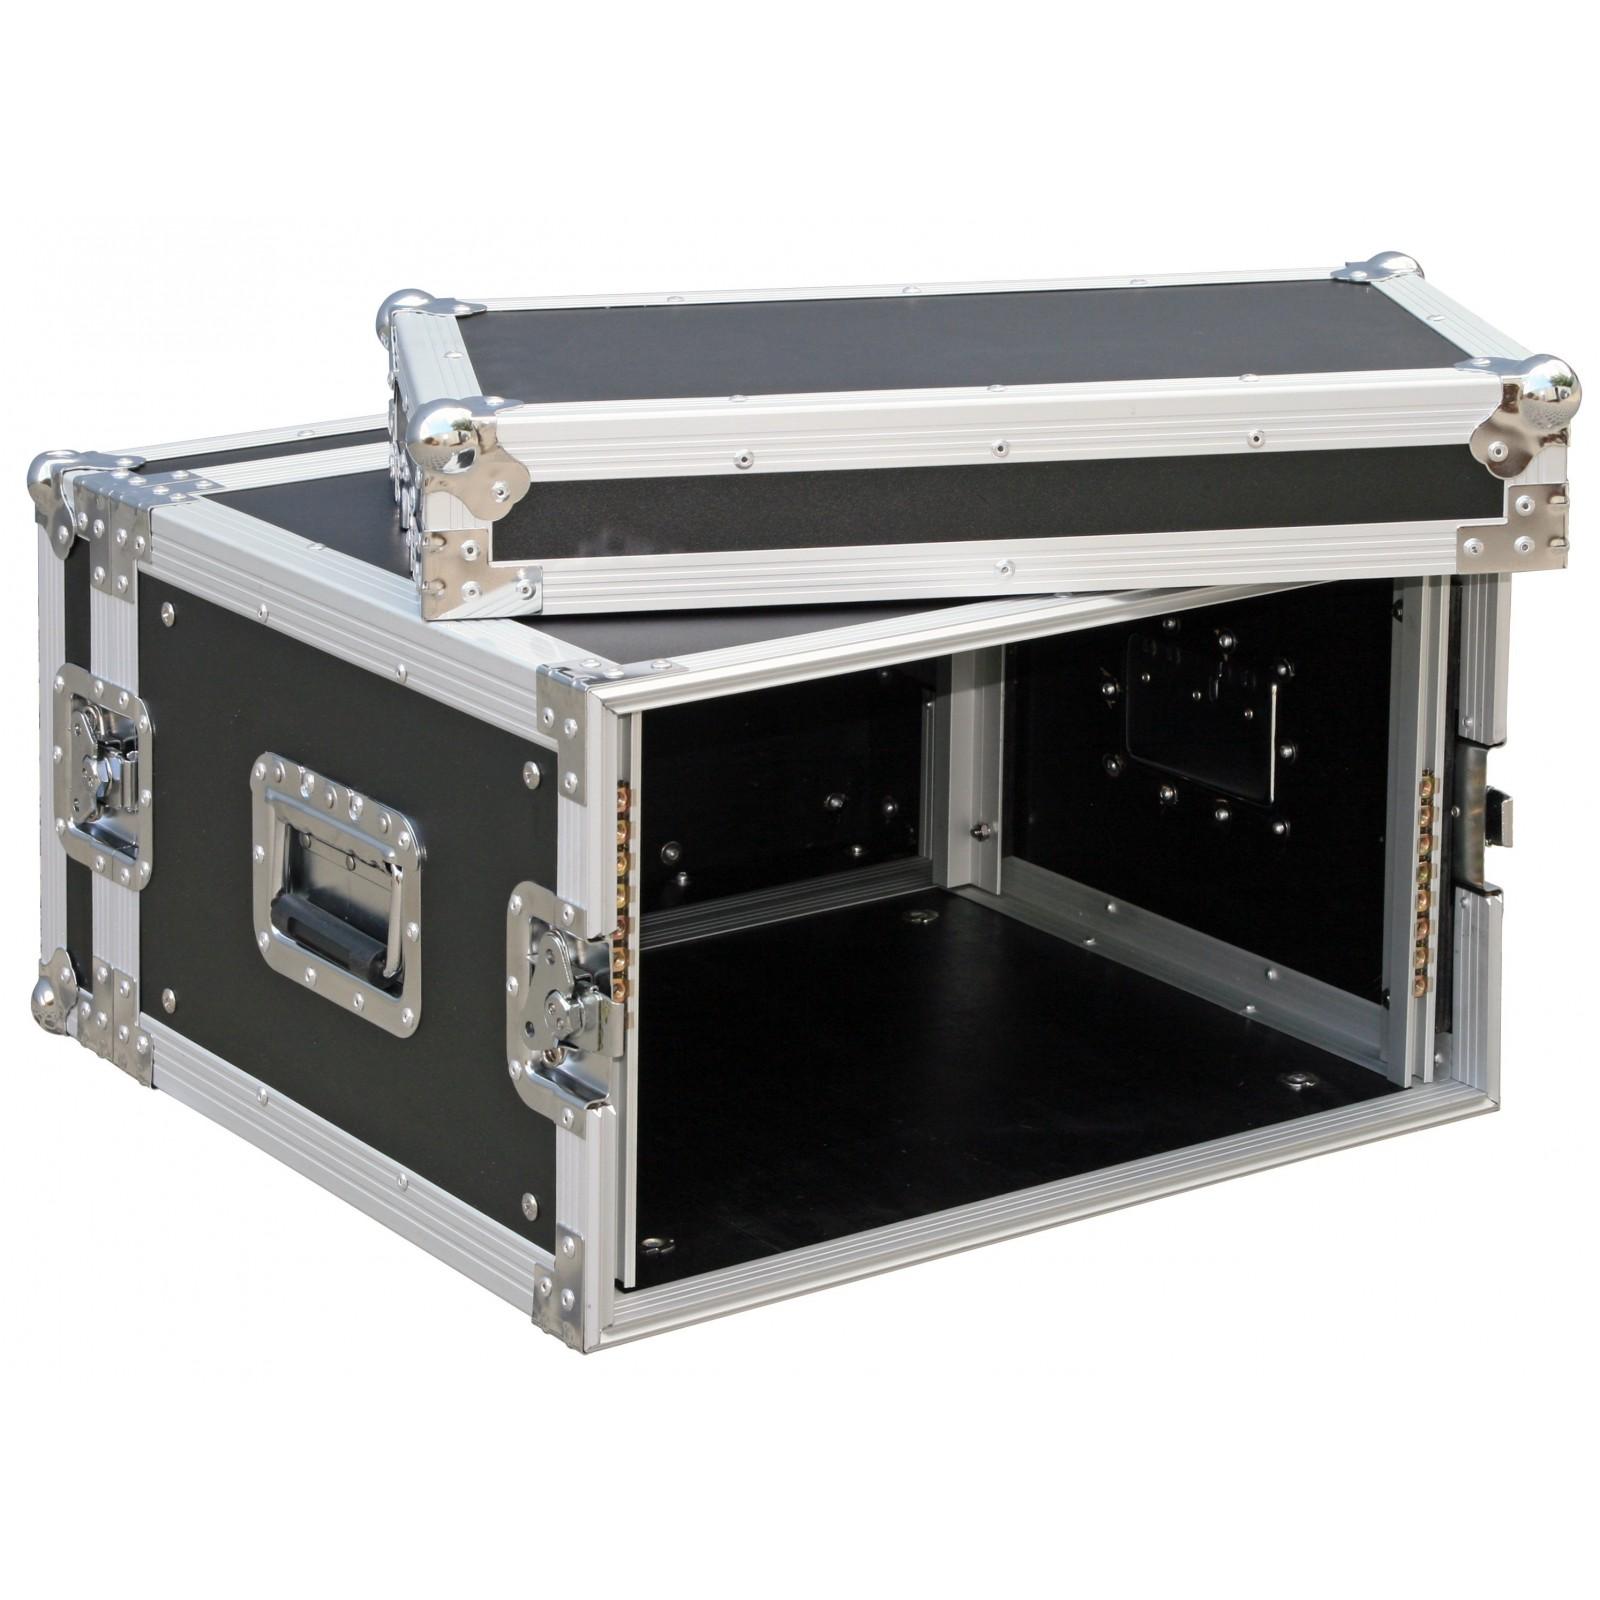 Jb systems rack case 6u flightcases for Rack mural 6u